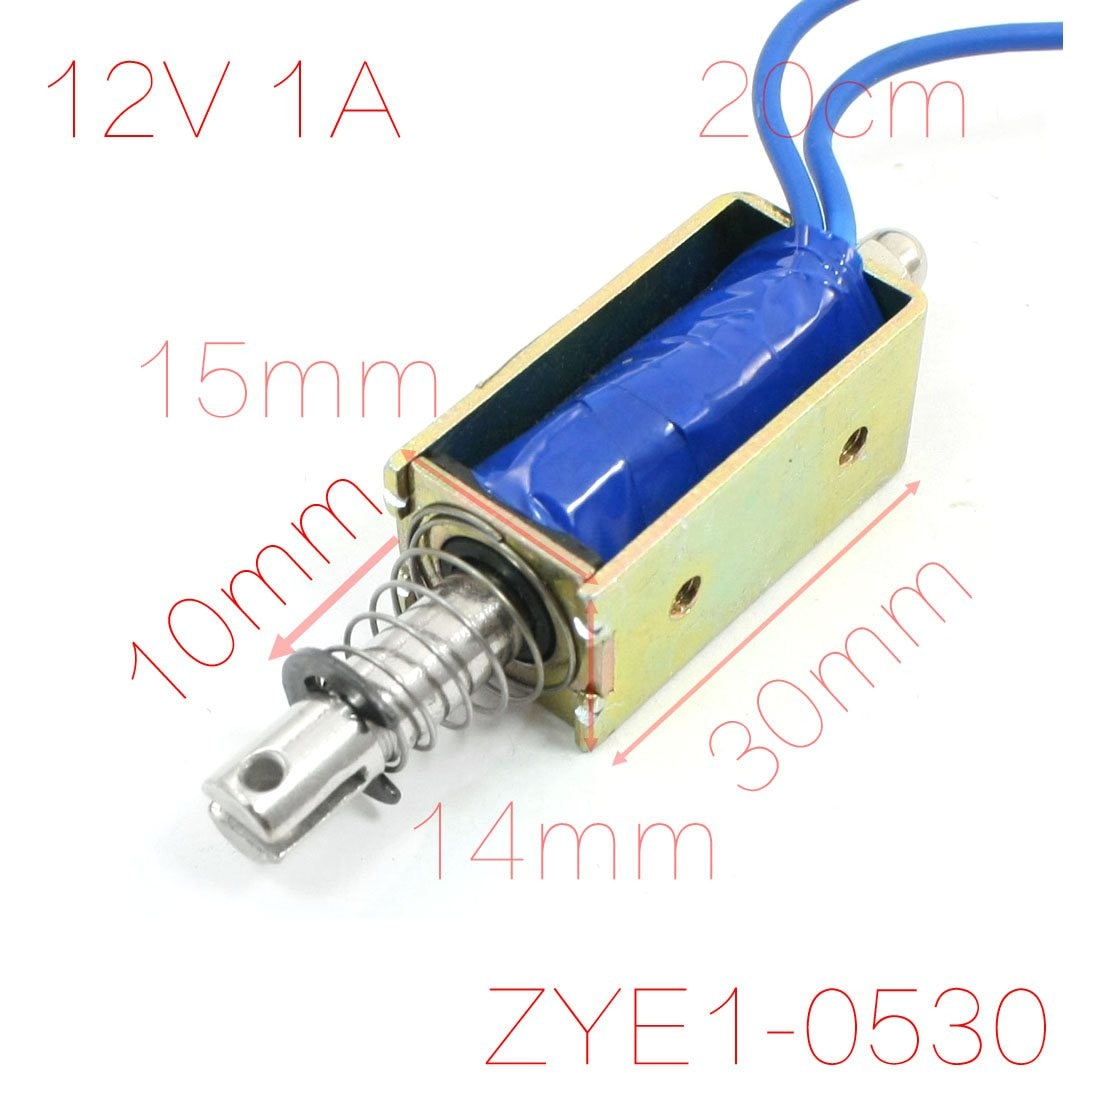 UXCELL 12V 1A 10Mm de carrera 600G Tipo Push Pull marco abierto electroimán para bancos ATM, máquinas expendedoras caja registradora